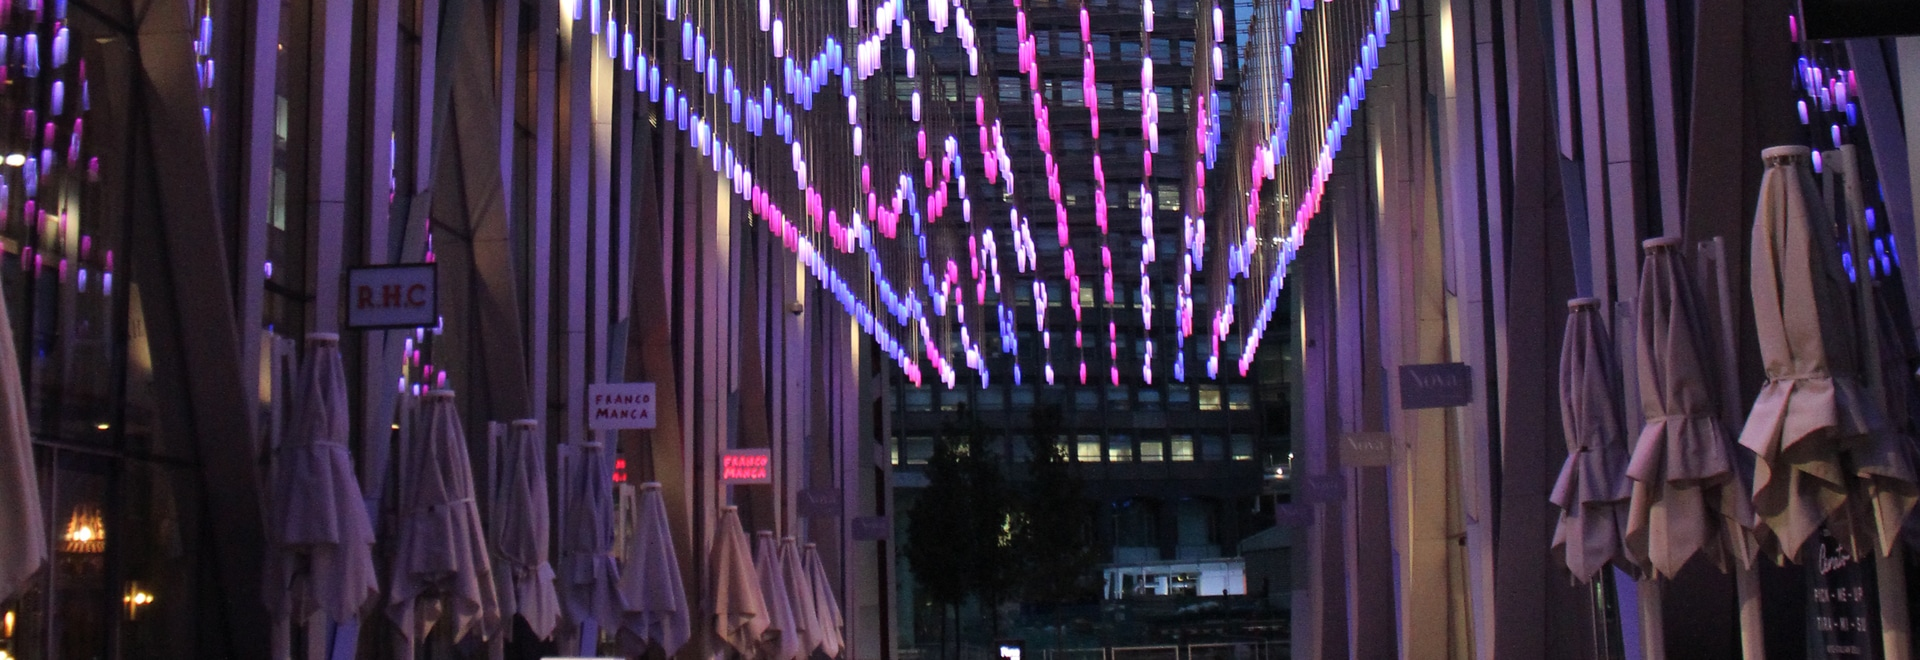 Catenary Lights at NOVA London